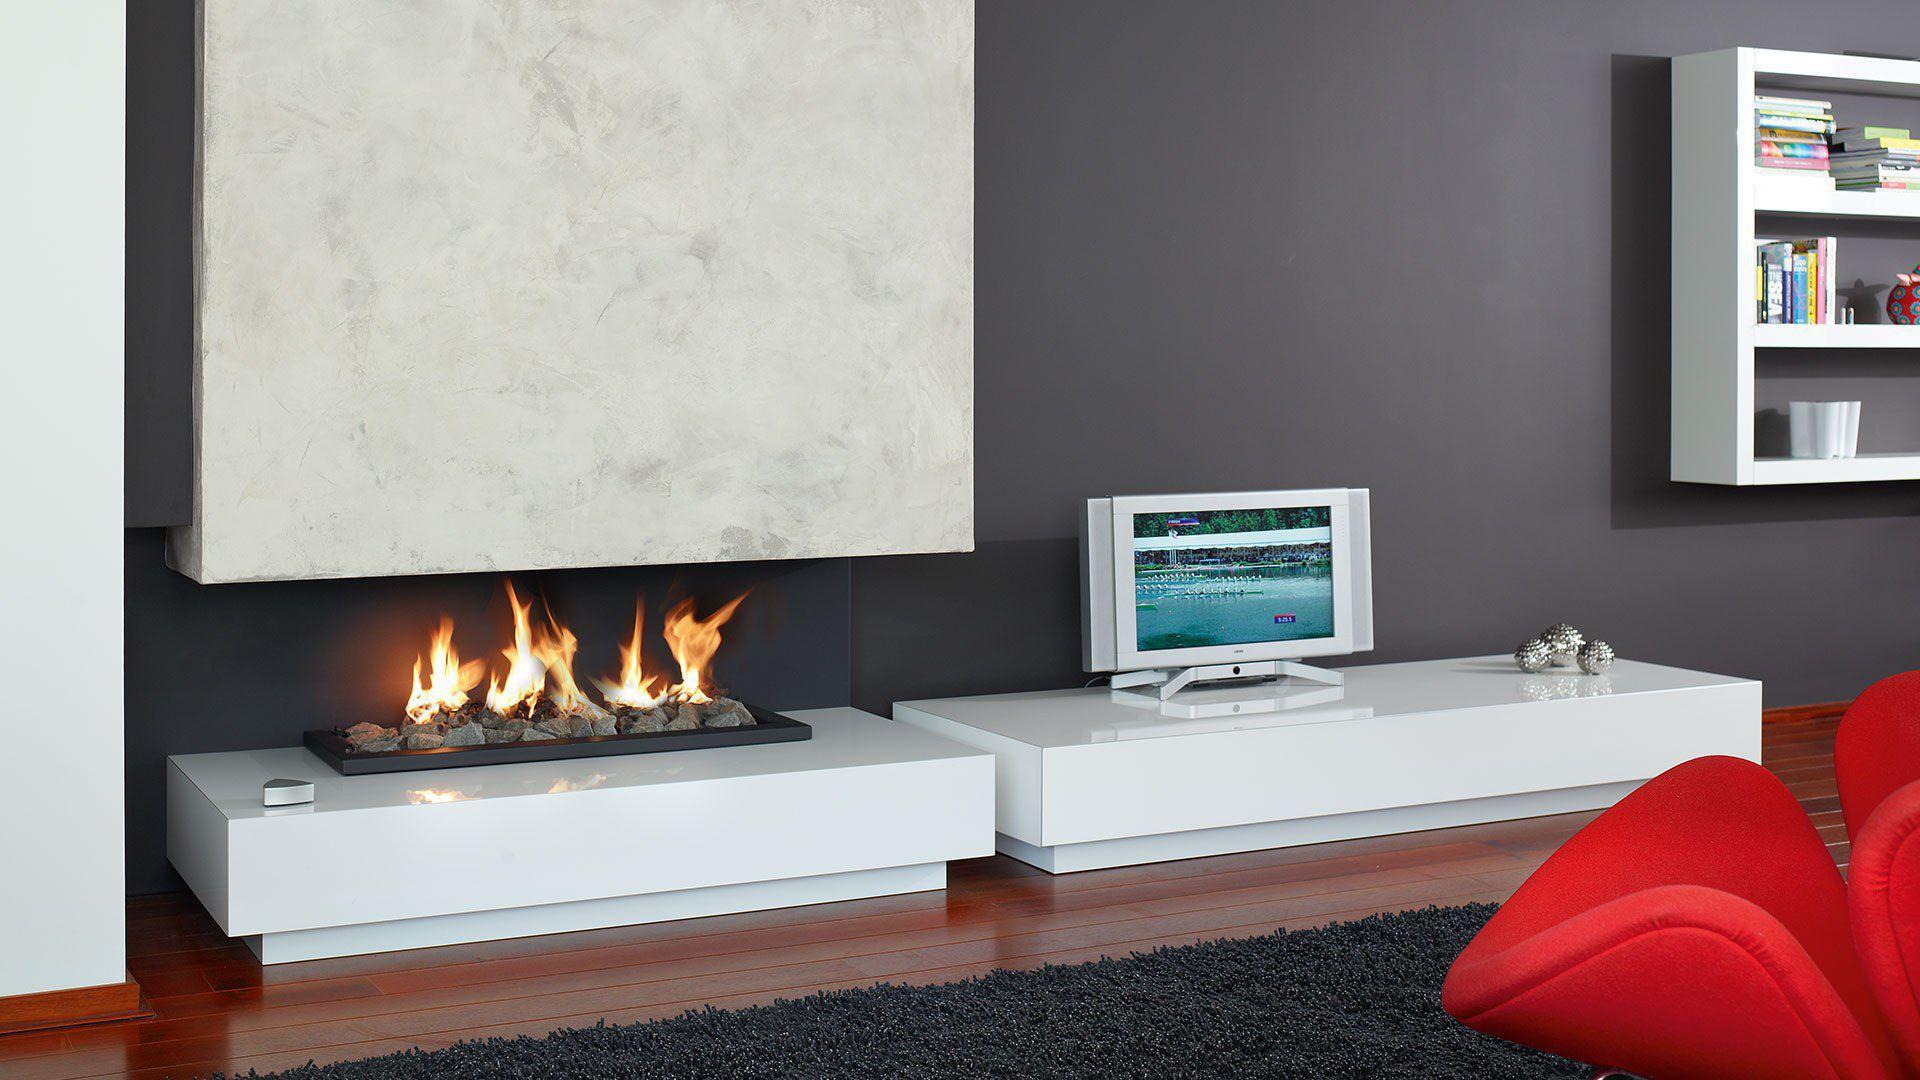 built gas description image in home fireplace